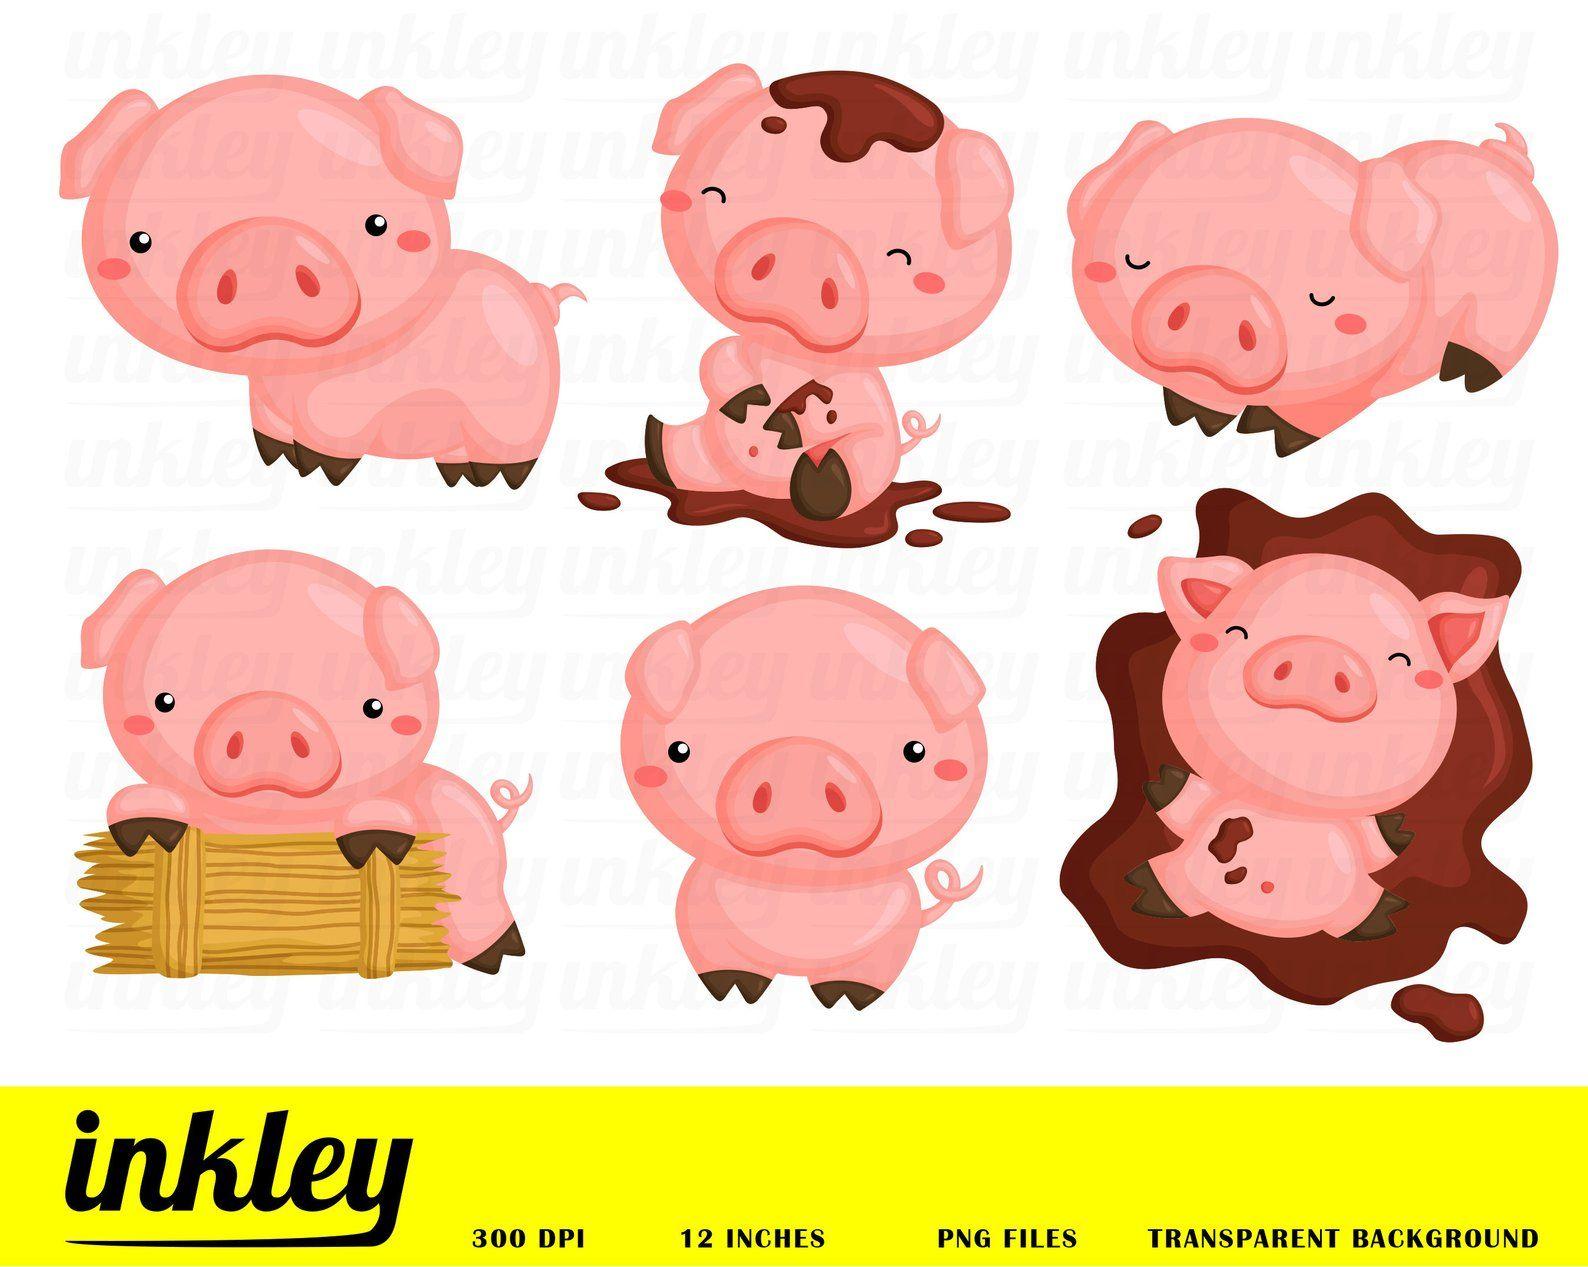 Cute Pig Clipart Cute Animal Clip Art Farm Animal Free Svg On Request Pig Clipart Pig Illustration Cute Pigs